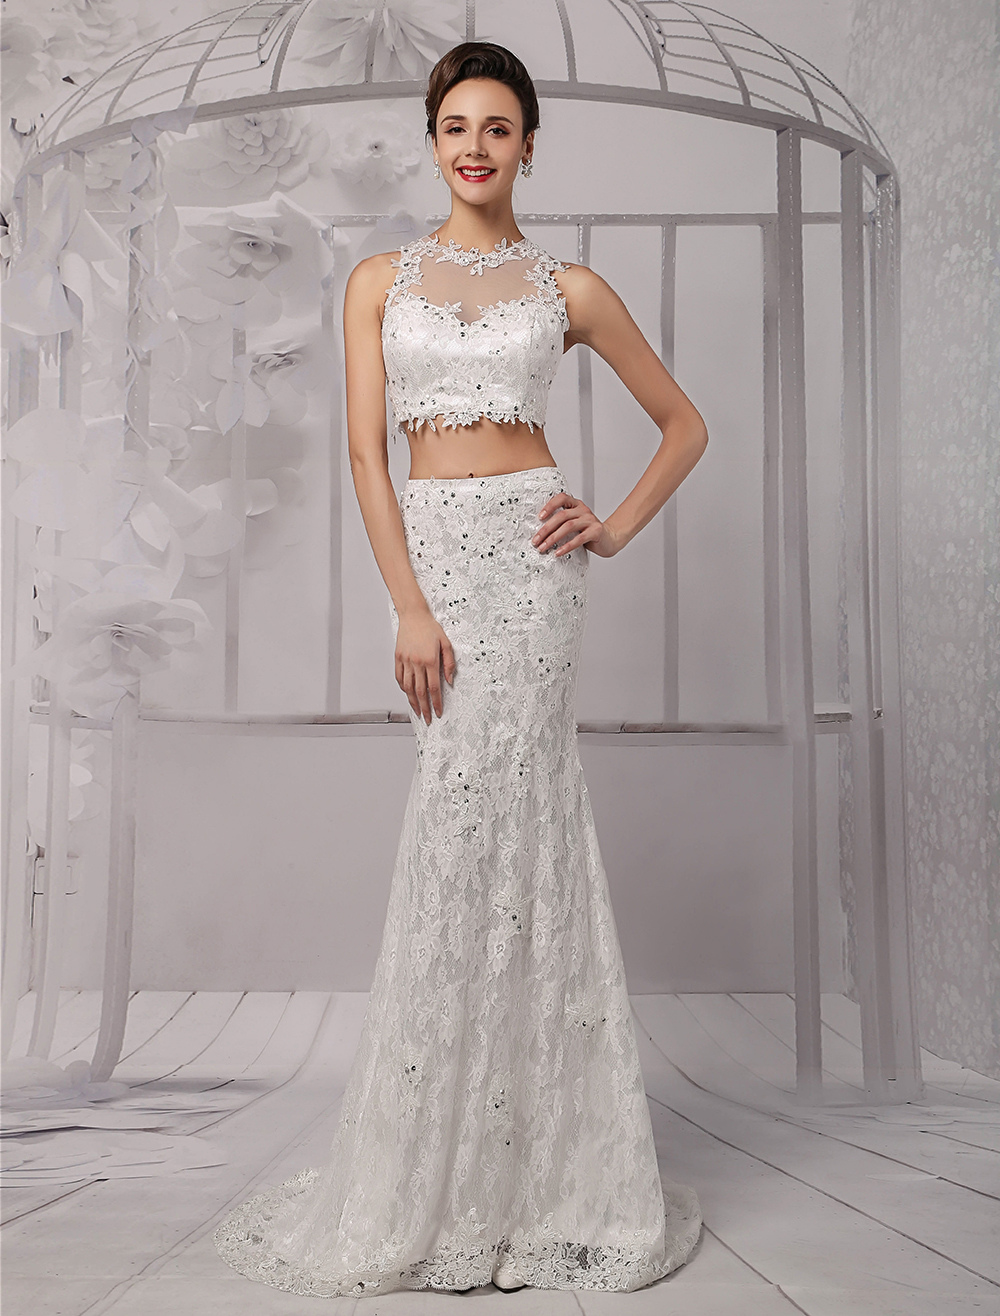 Souvent Two Piece Crop-top Illusion Neckline Lace Mermaid Wedding Dress  MQ99